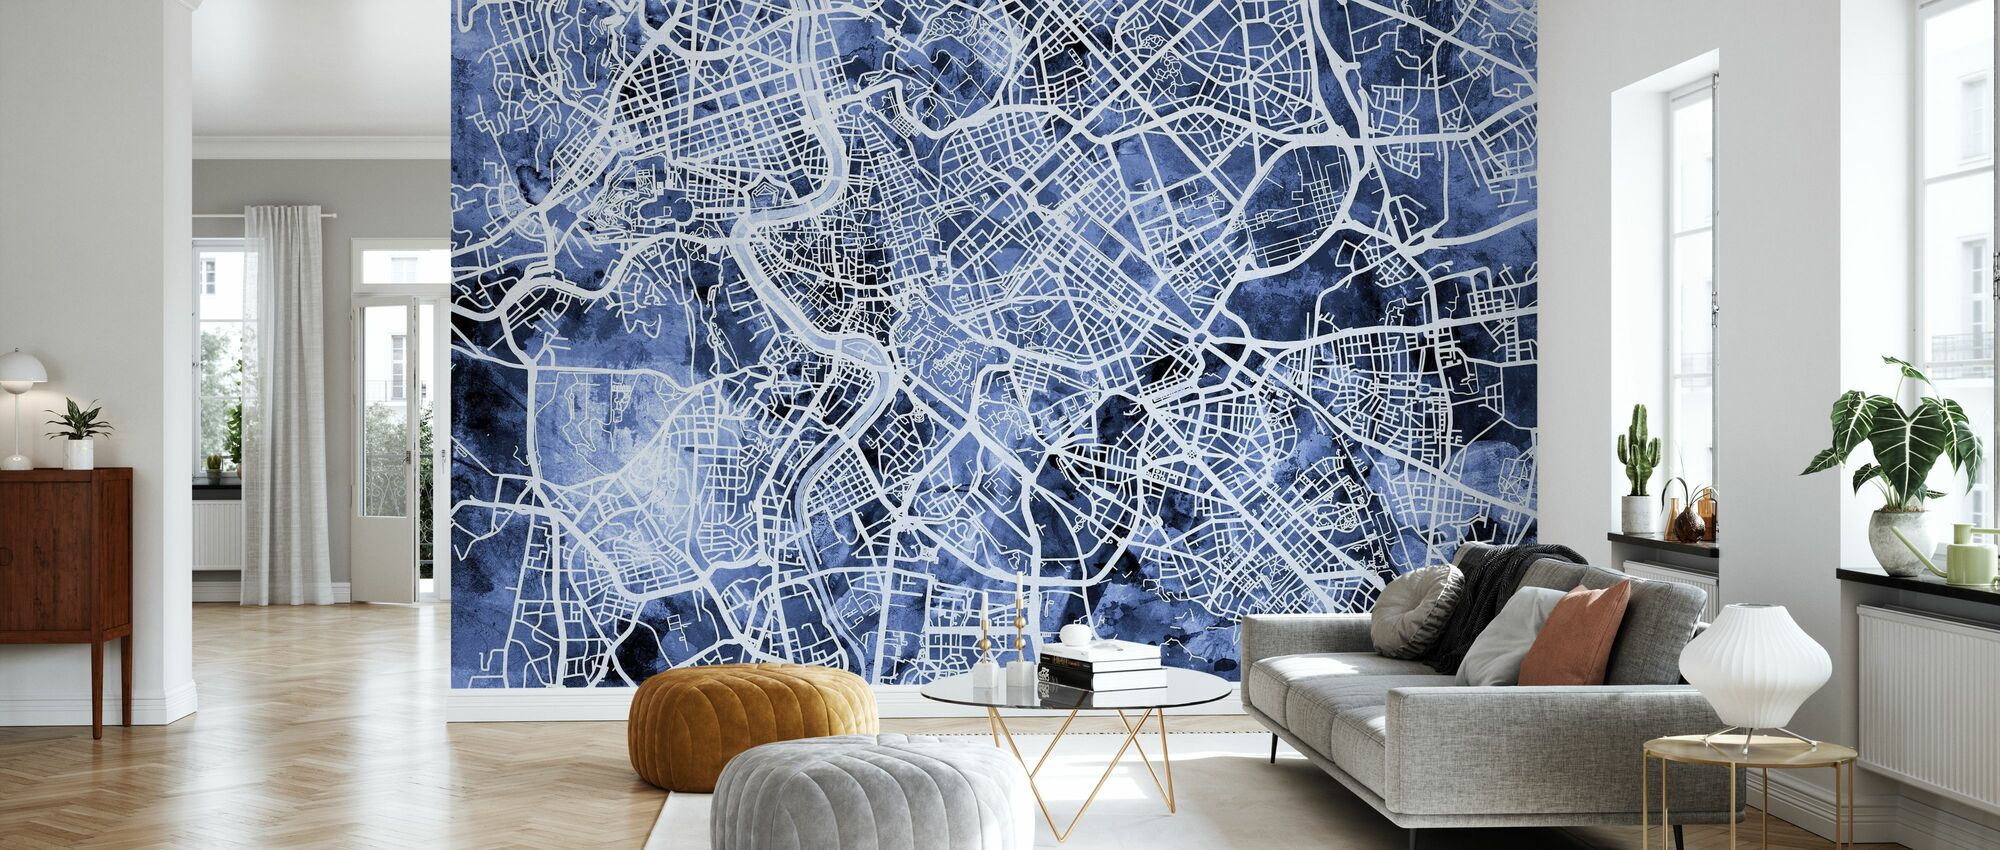 Rome Italy City Street Map - Wallpaper - Living Room